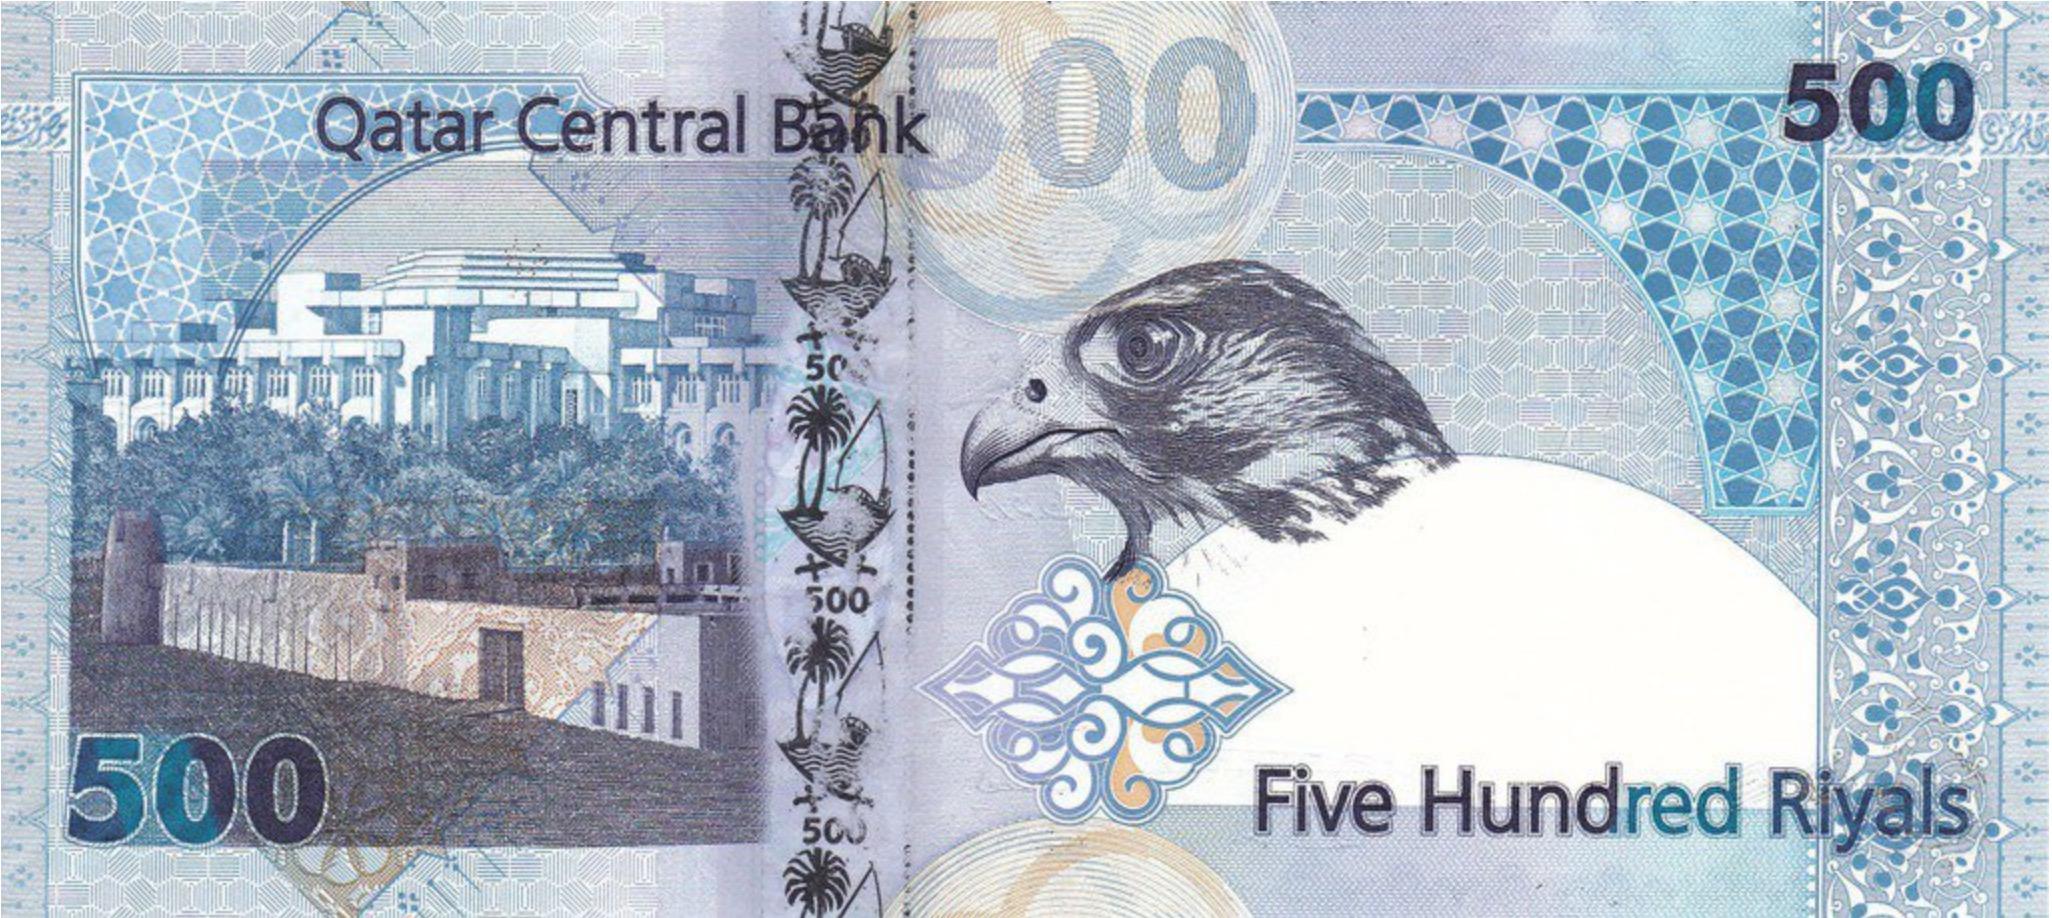 Current Qatari Riyal Banknotes